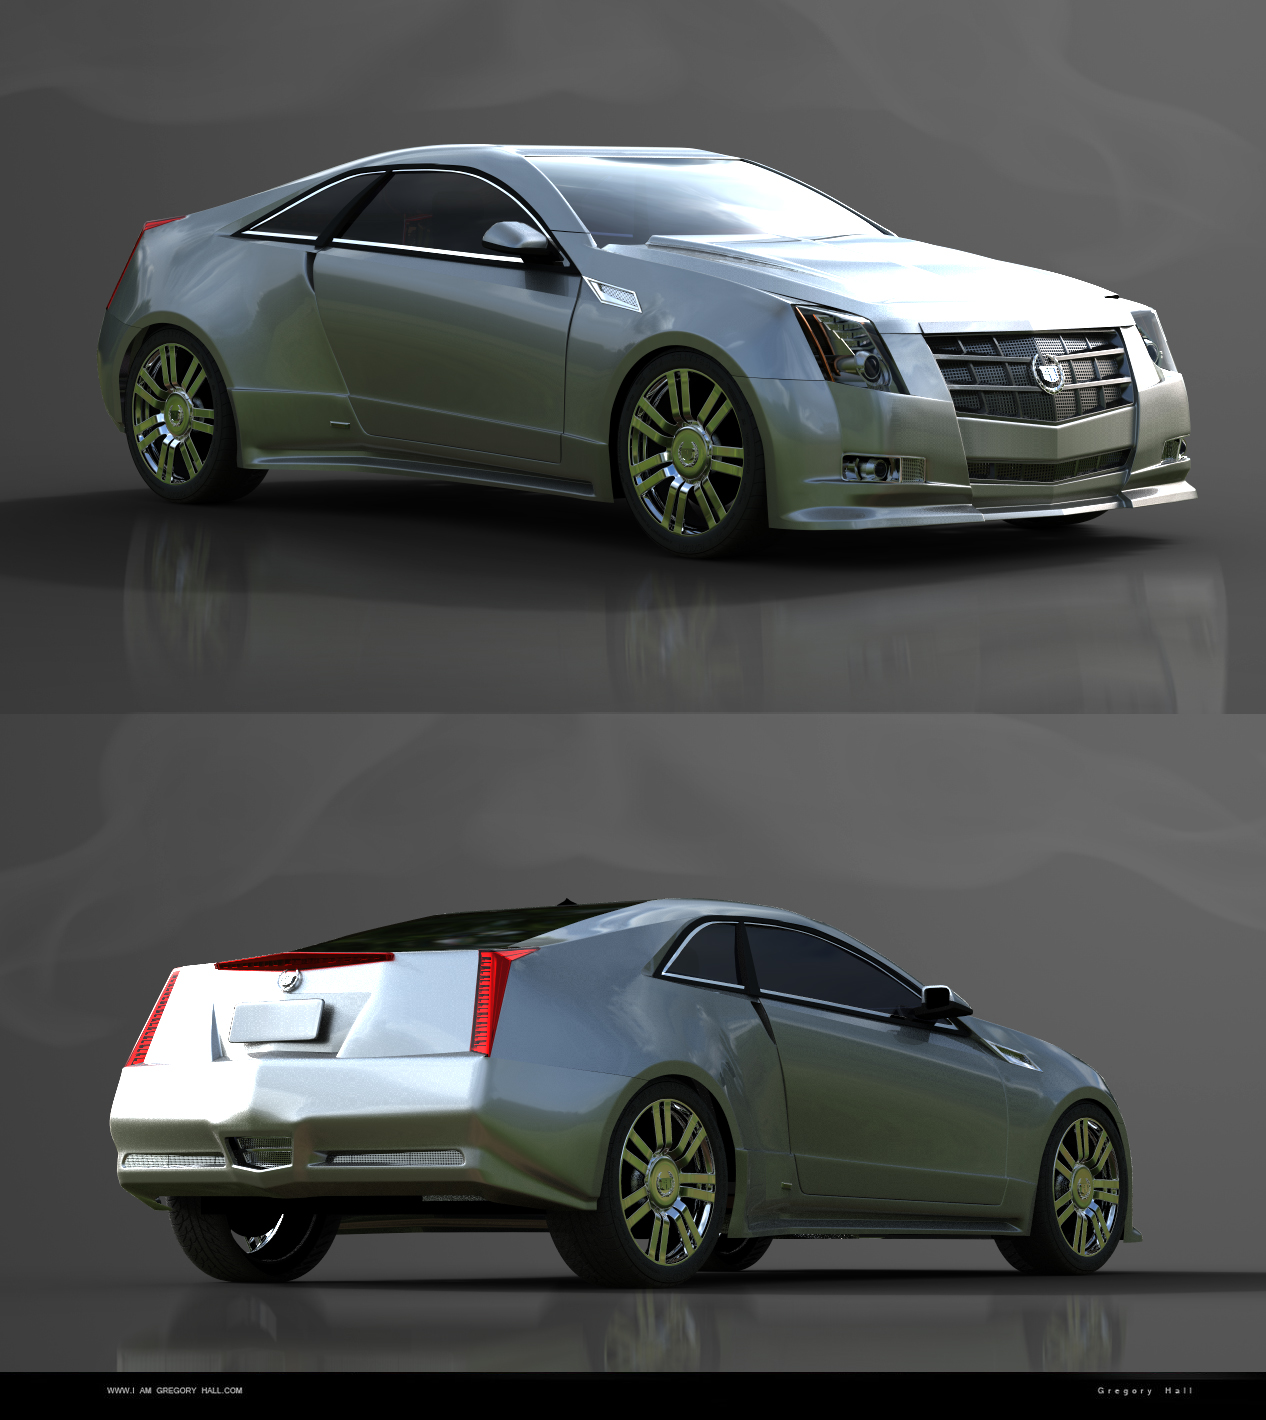 Cgtalk 2010 Cadillac Cts Coupe